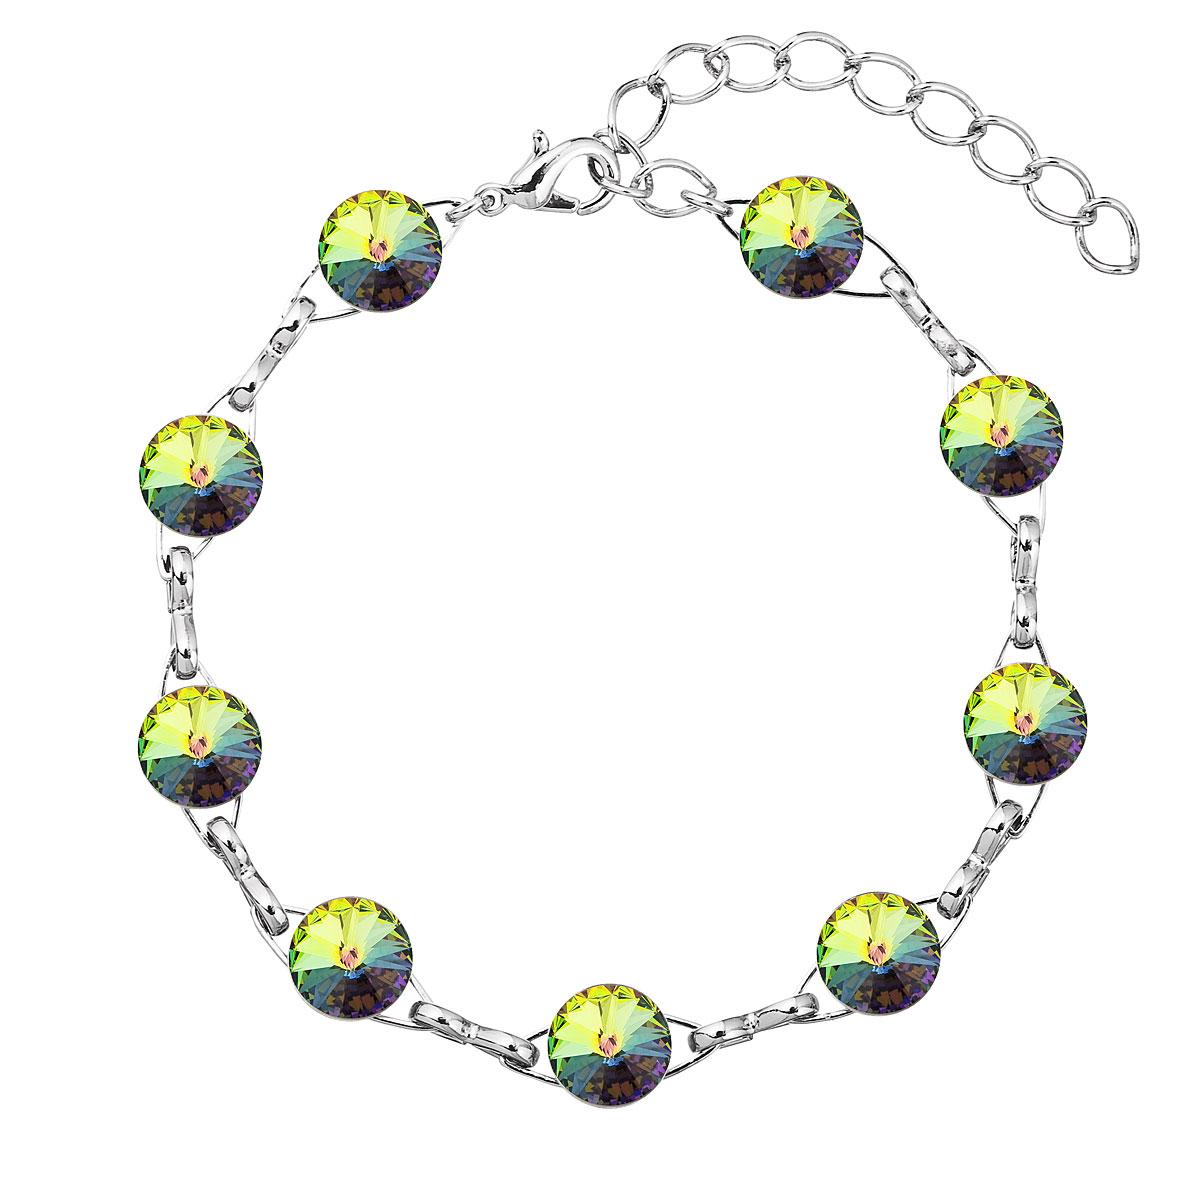 Náramek bižuterie se Swarovski krystaly zelený 53001.5